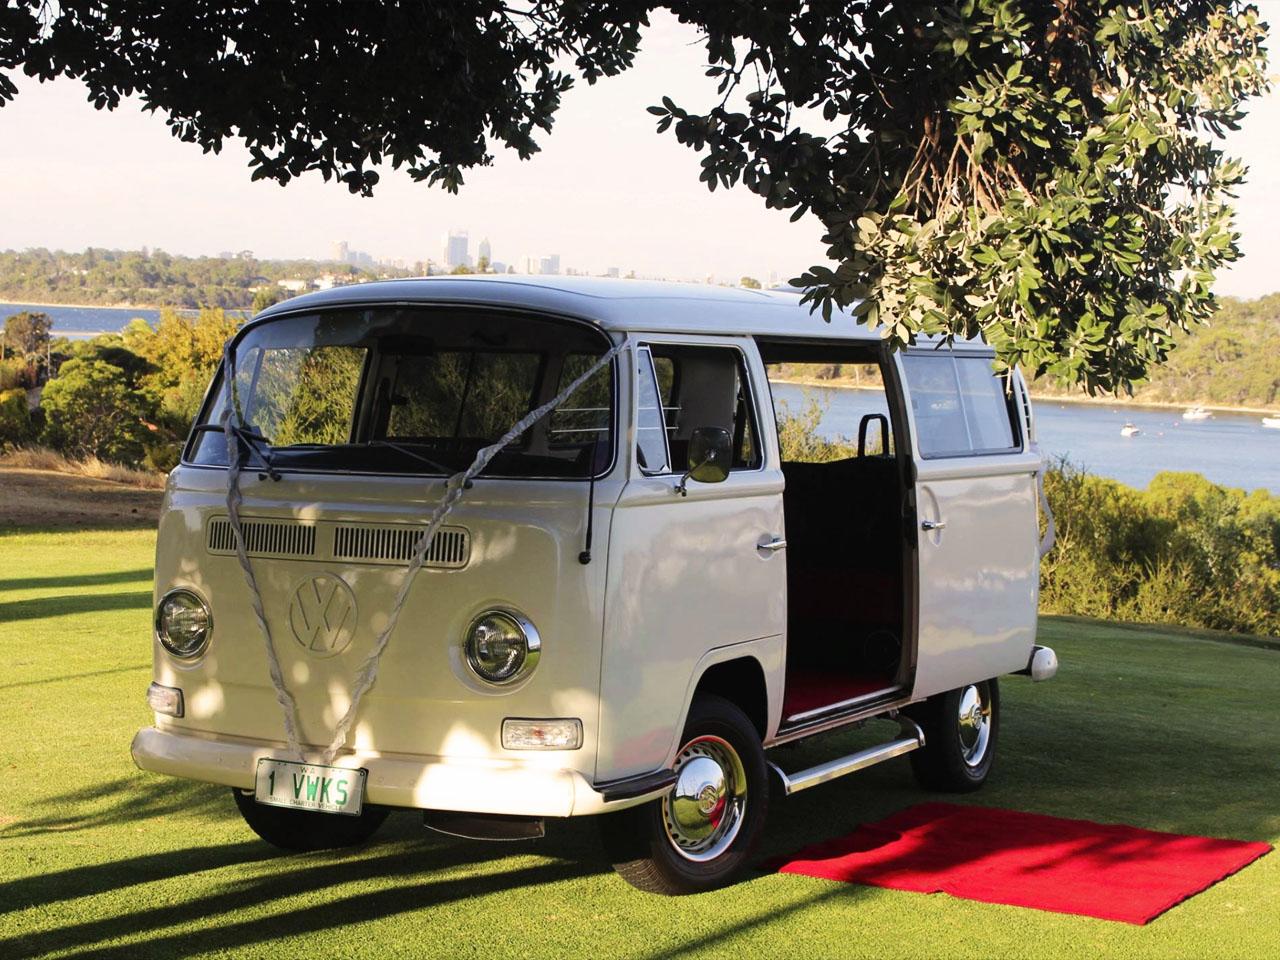 White Combi Van with Red Carpet